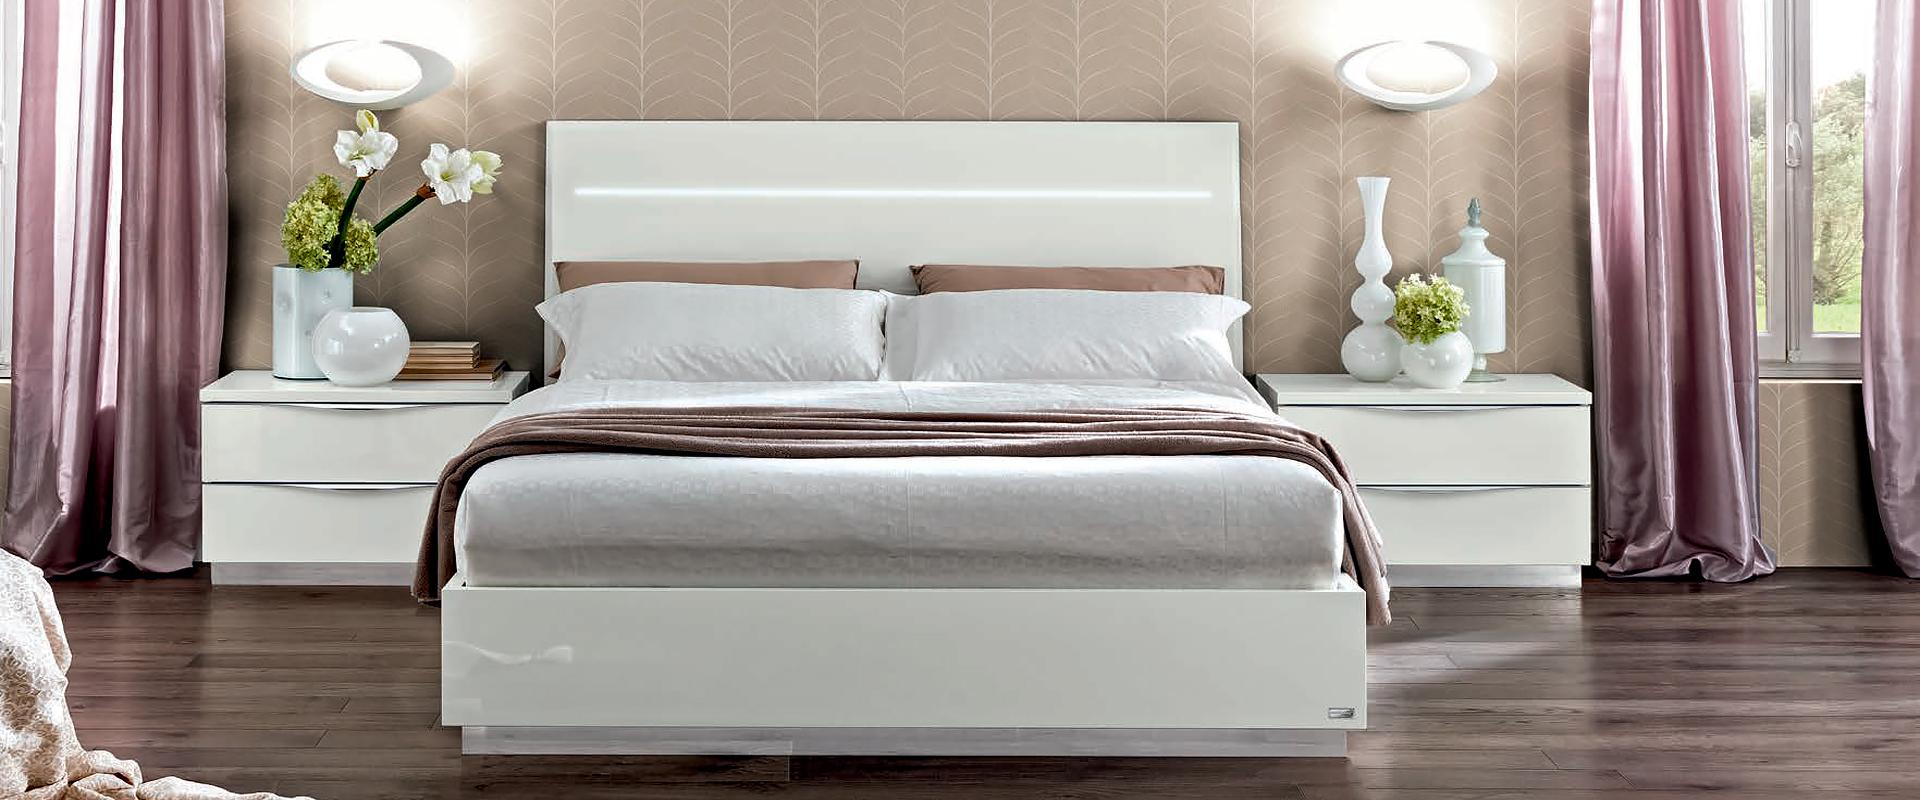 спальня onda white